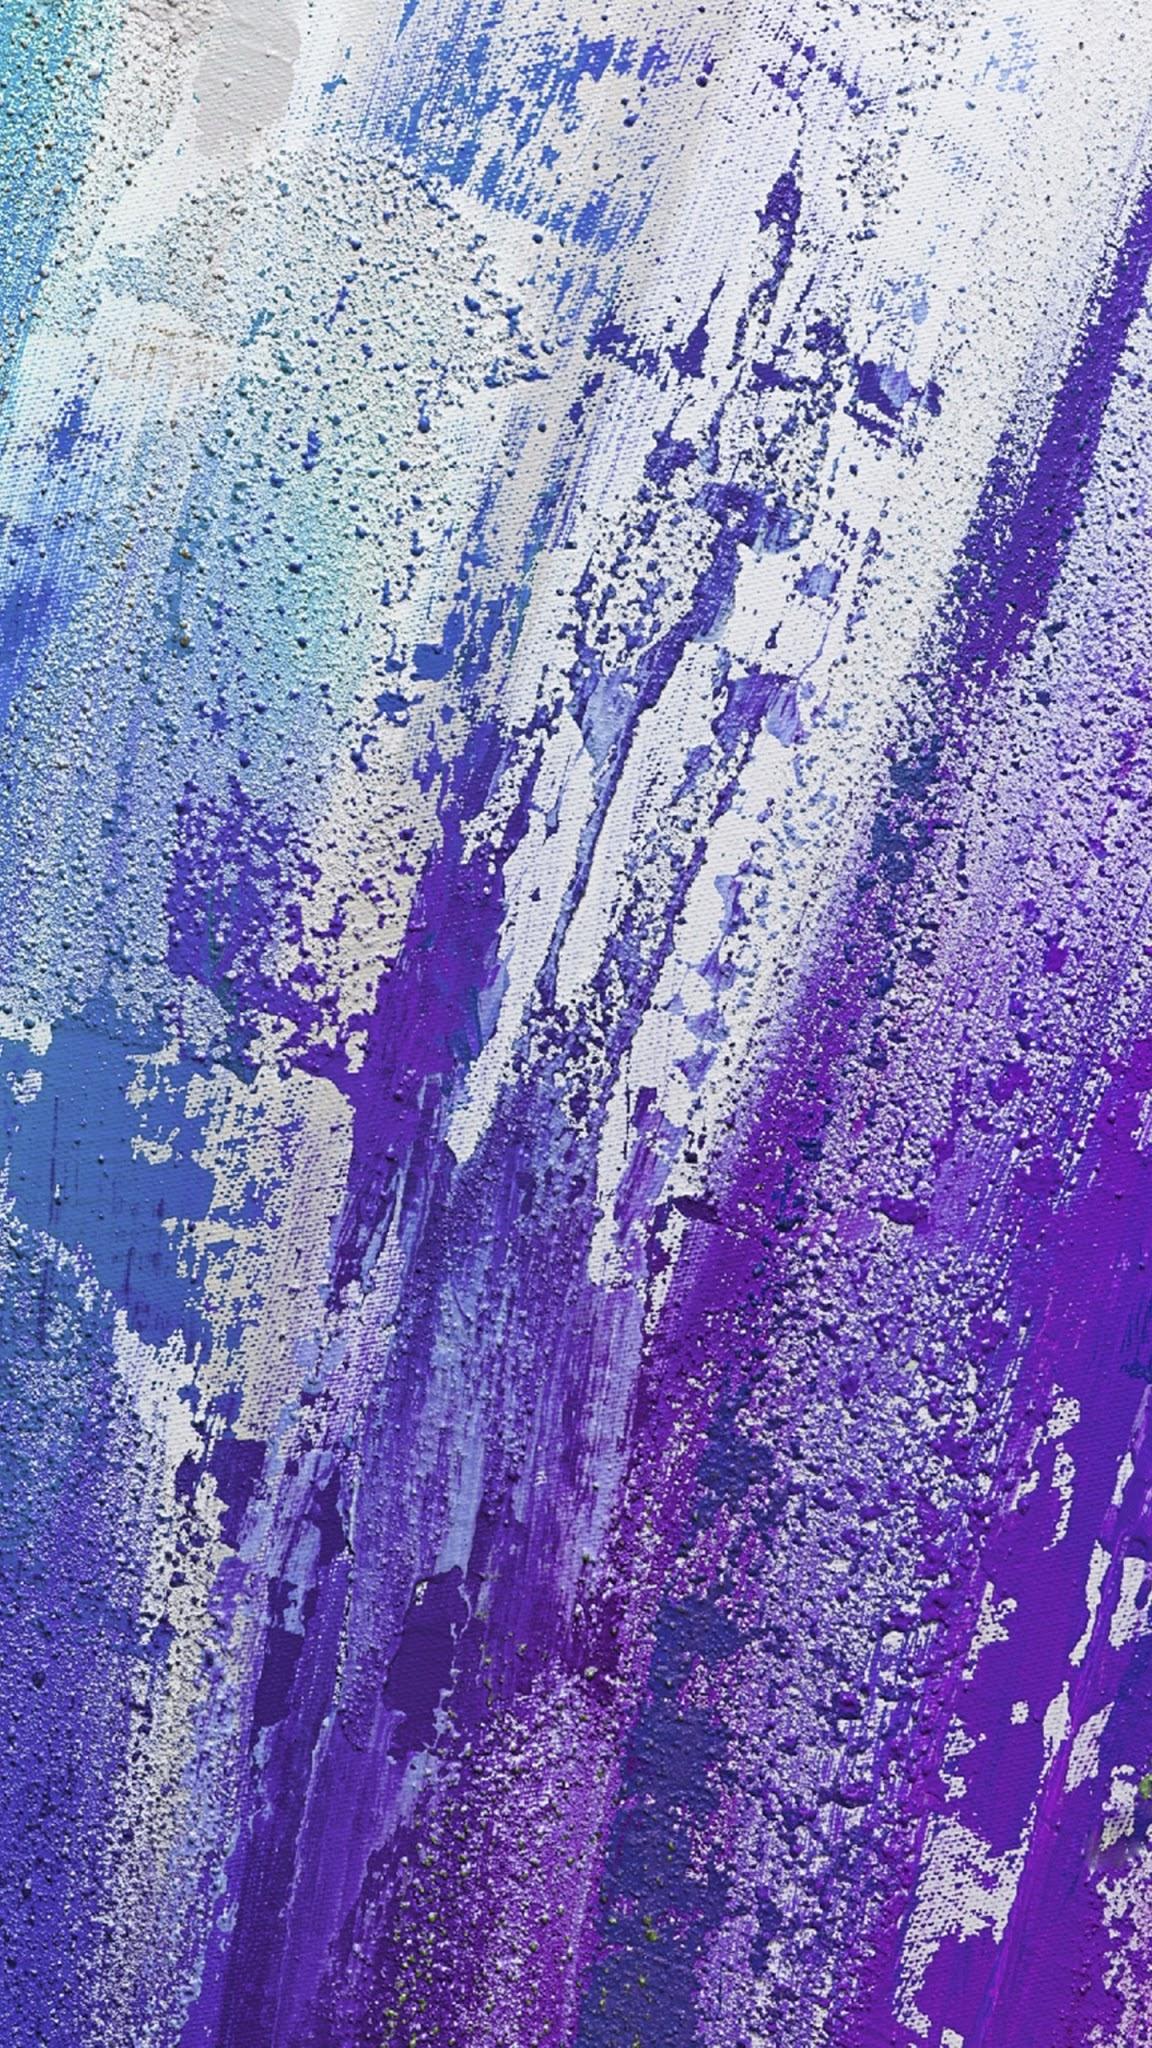 Berühmt Wallpapers samsung Galaxy S7 et S7 Edge - Pack 003 - WallsPhone DB34